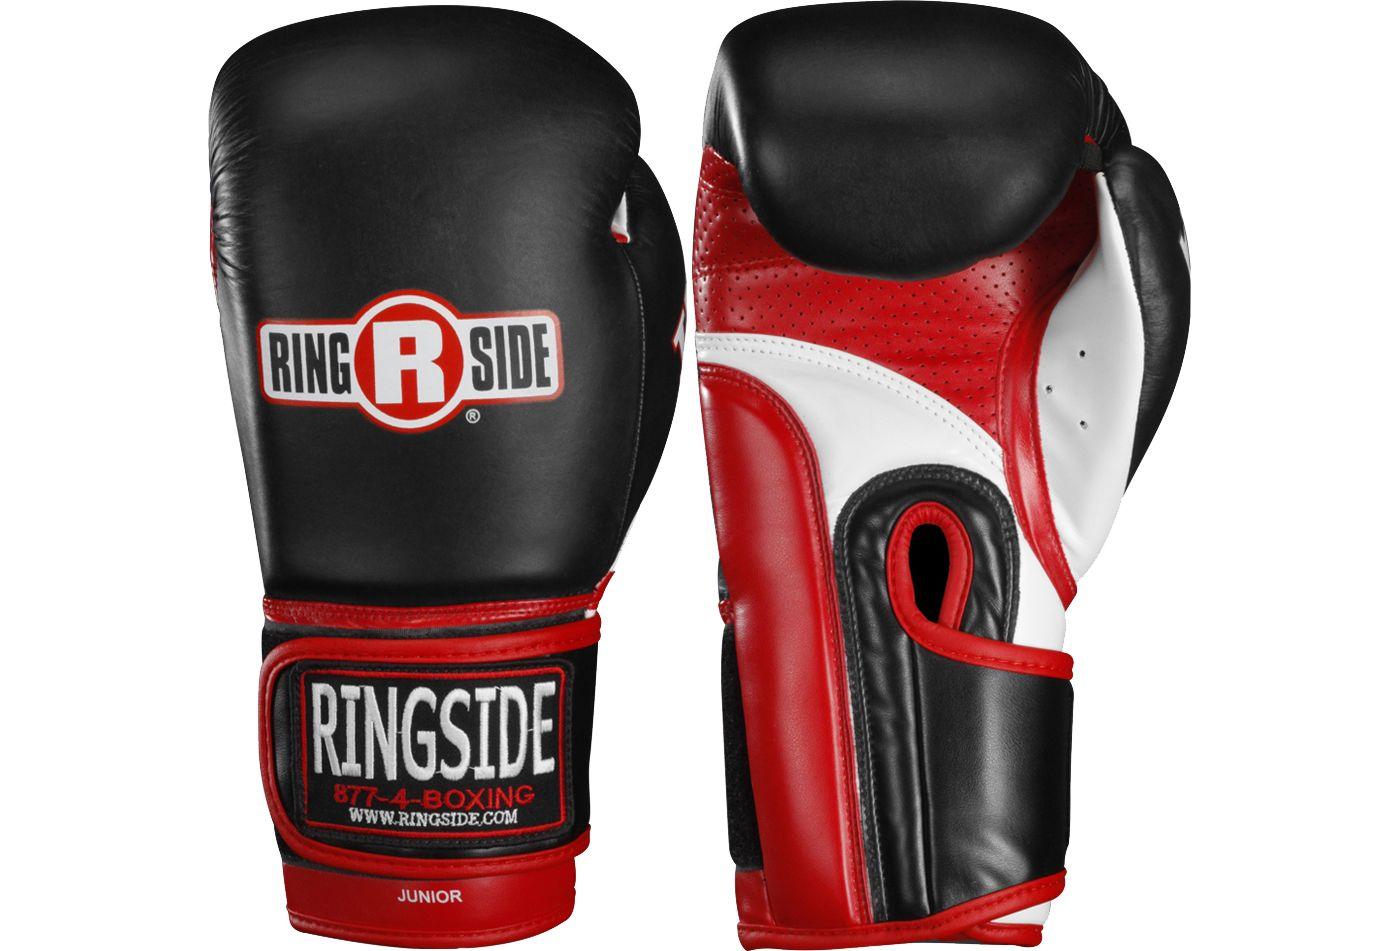 Ringside IMF Super Bag Gloves